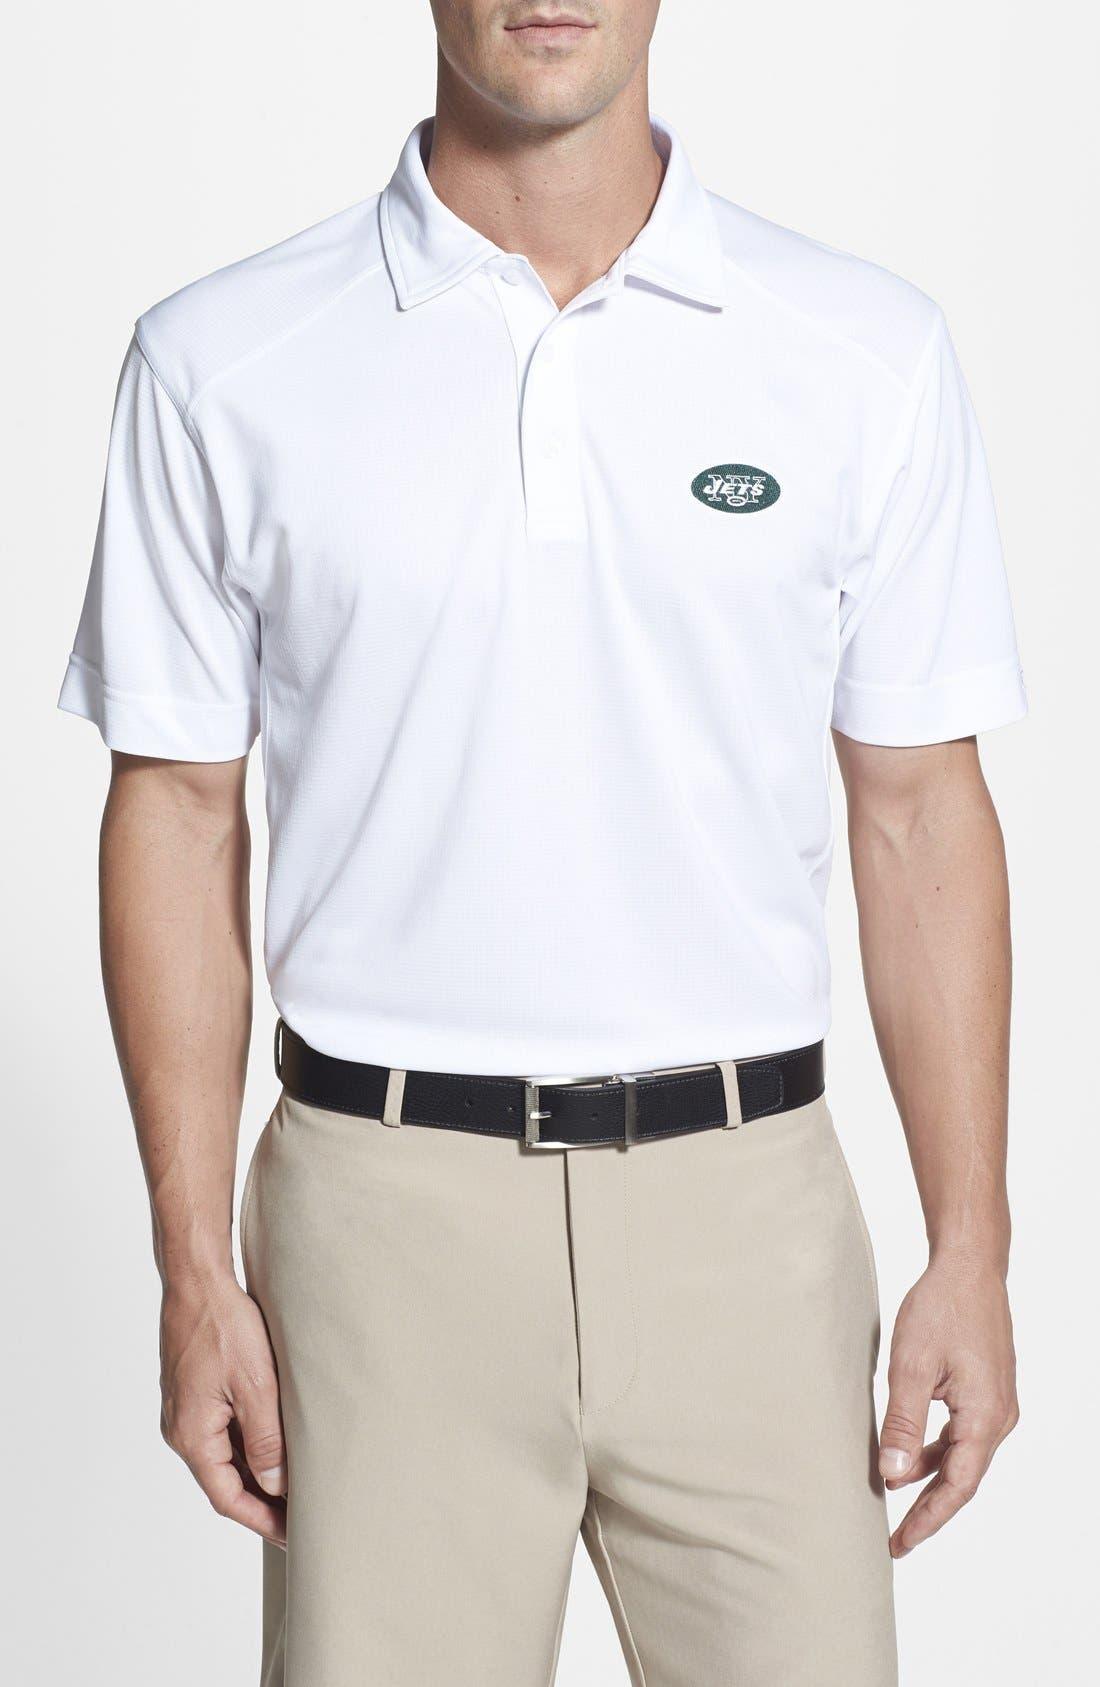 New York Jets - Genre DryTec Moisture Wicking Polo,                         Main,                         color, White